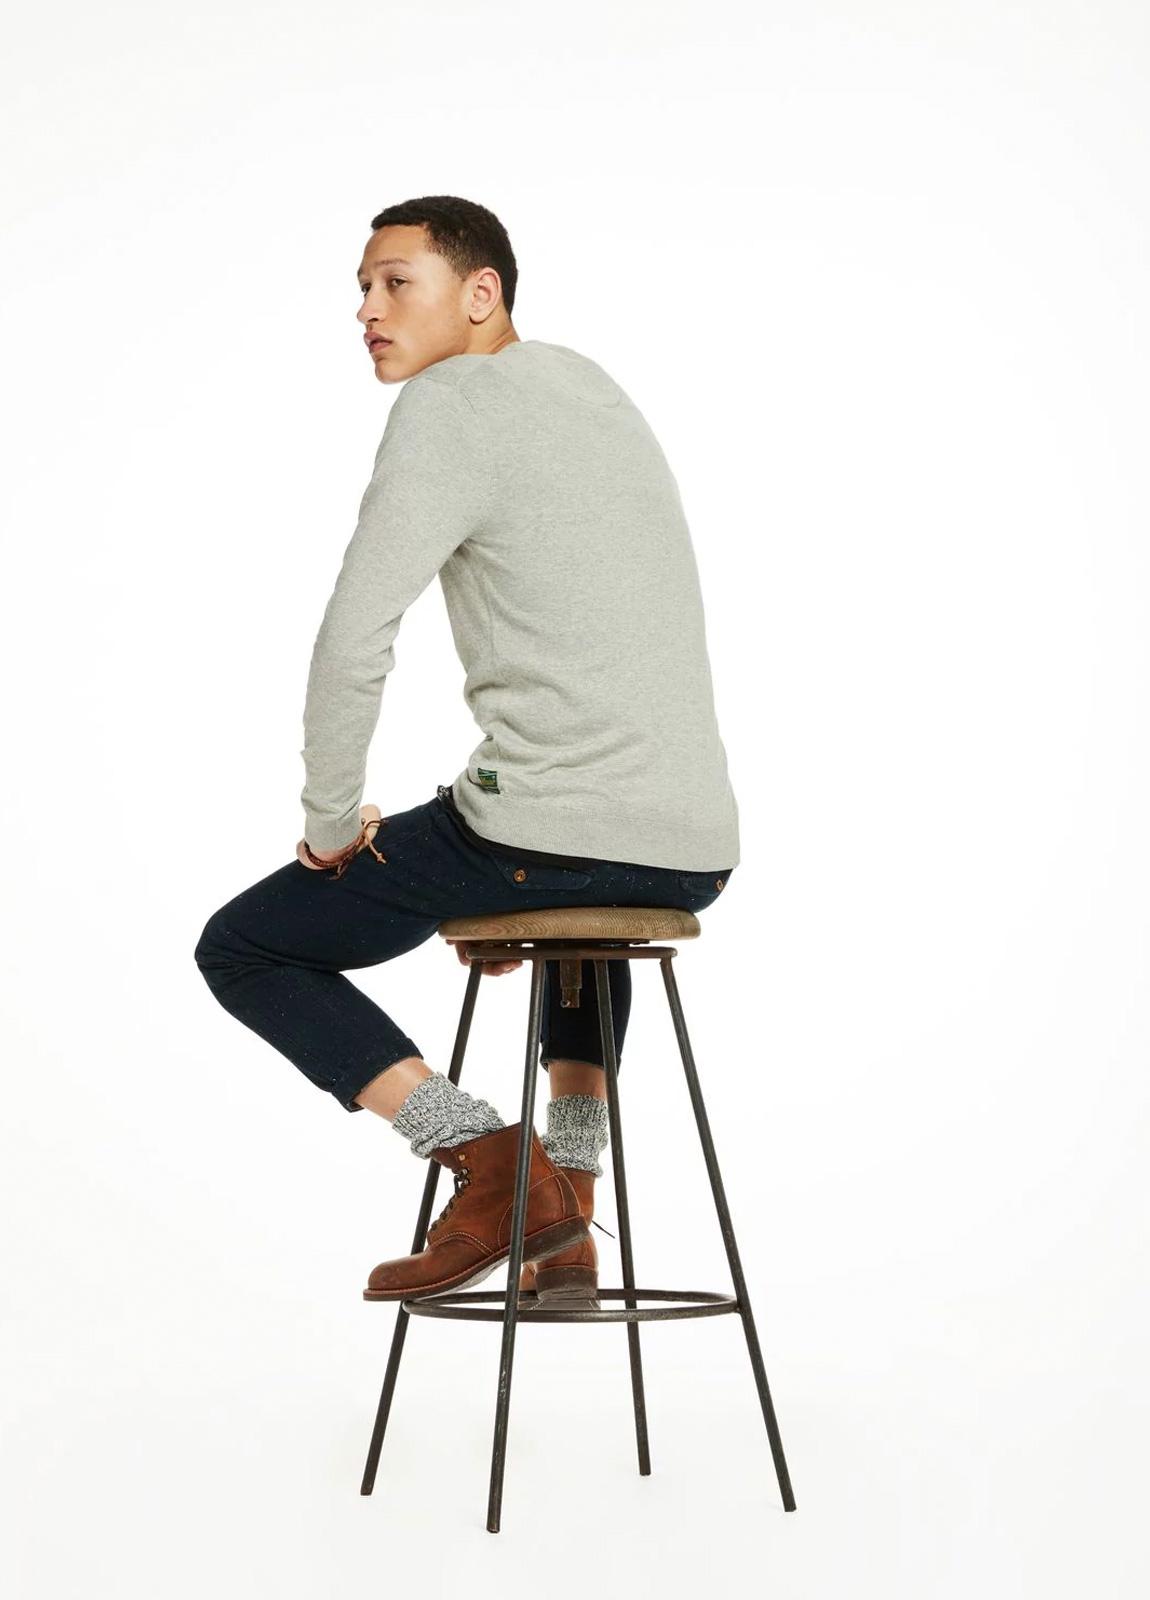 Jersey cuello redondo color gris. 95% Algodón 5% Cashmere. - Ítem2